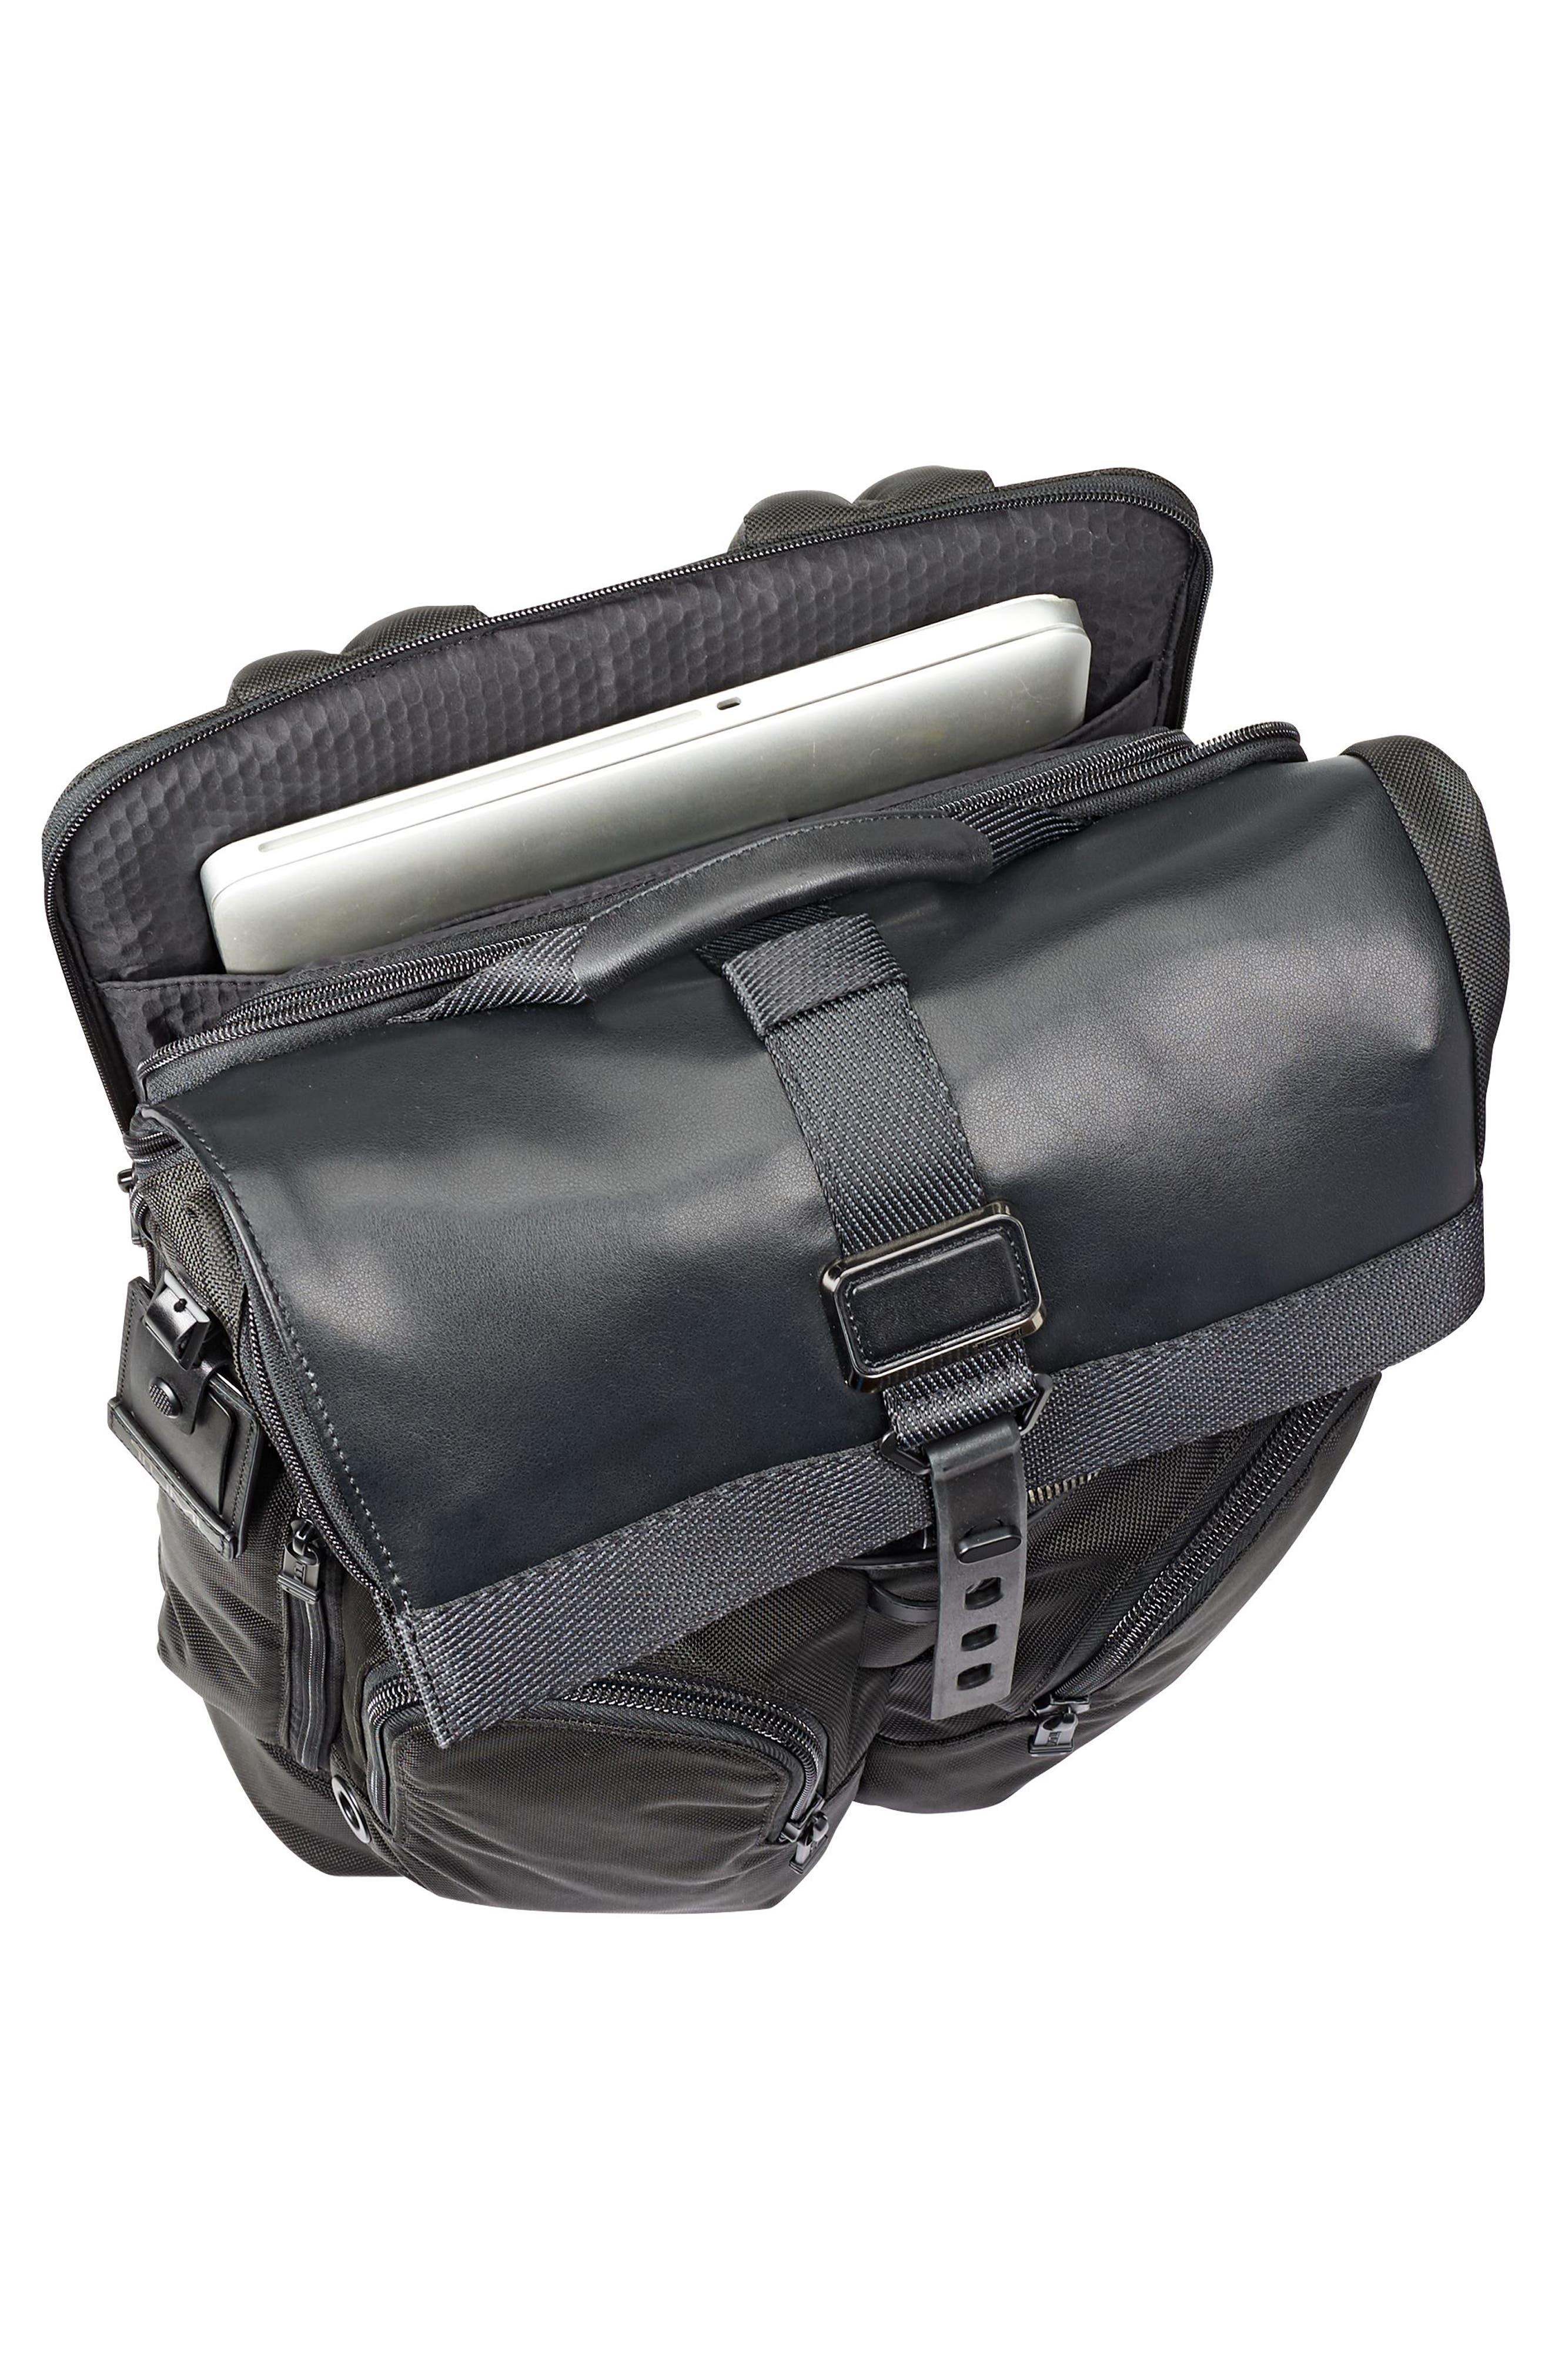 Alpha Bravo - London Backpack,                             Alternate thumbnail 3, color,                             BLACK